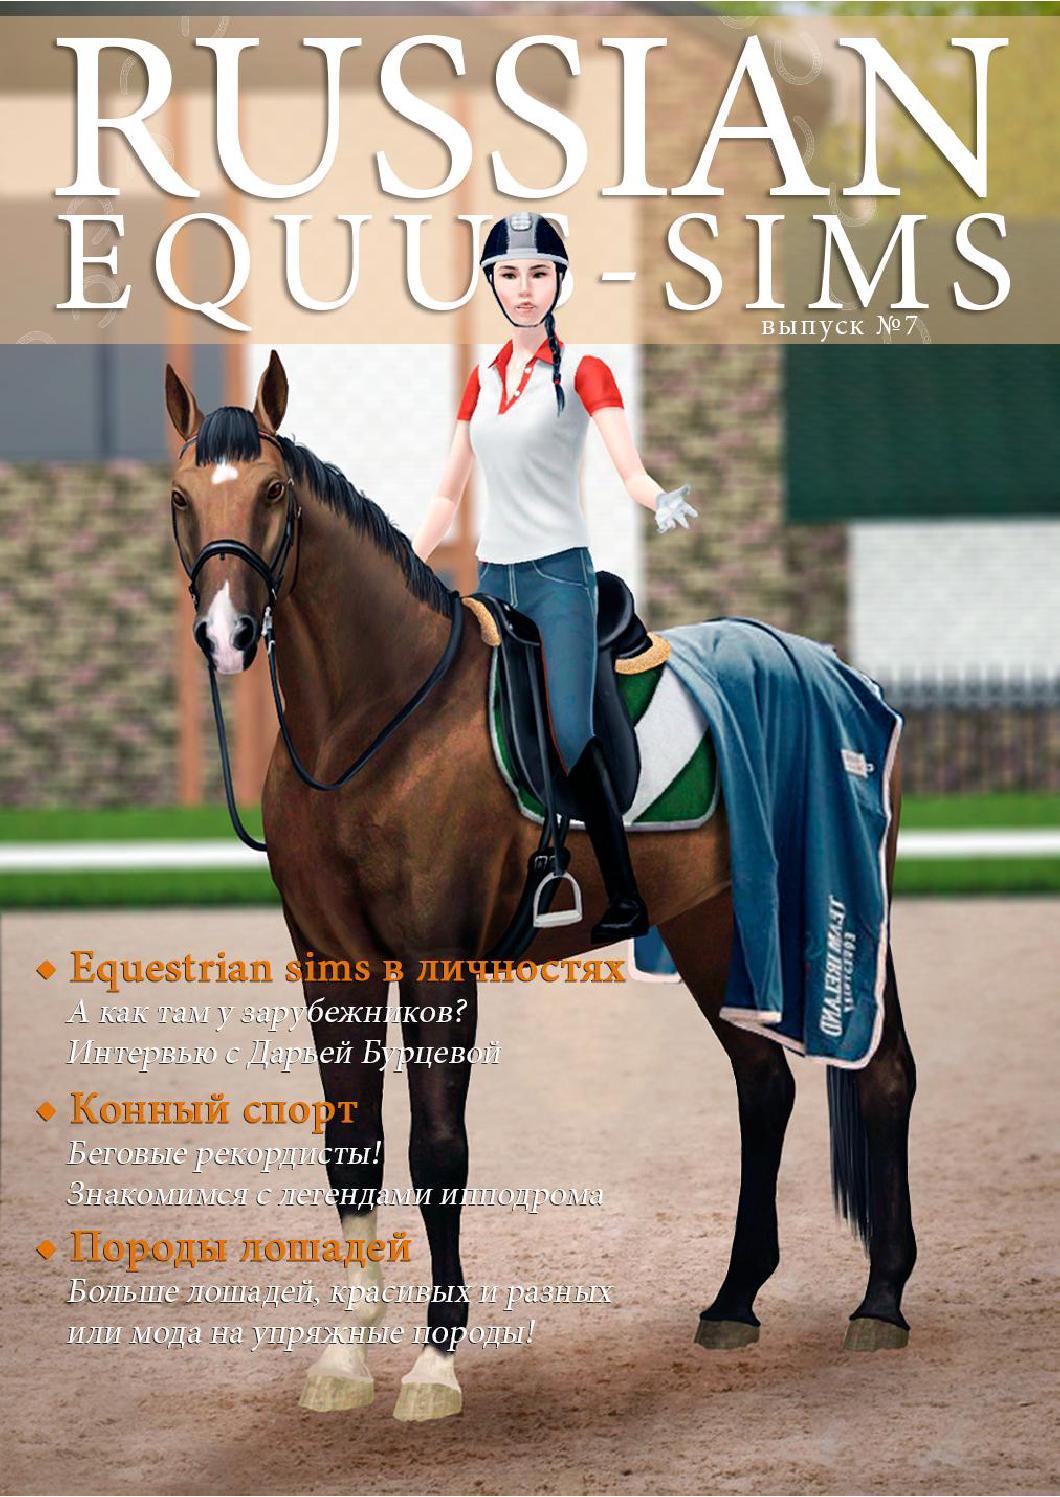 Equus-sims cc-database: warmblood.